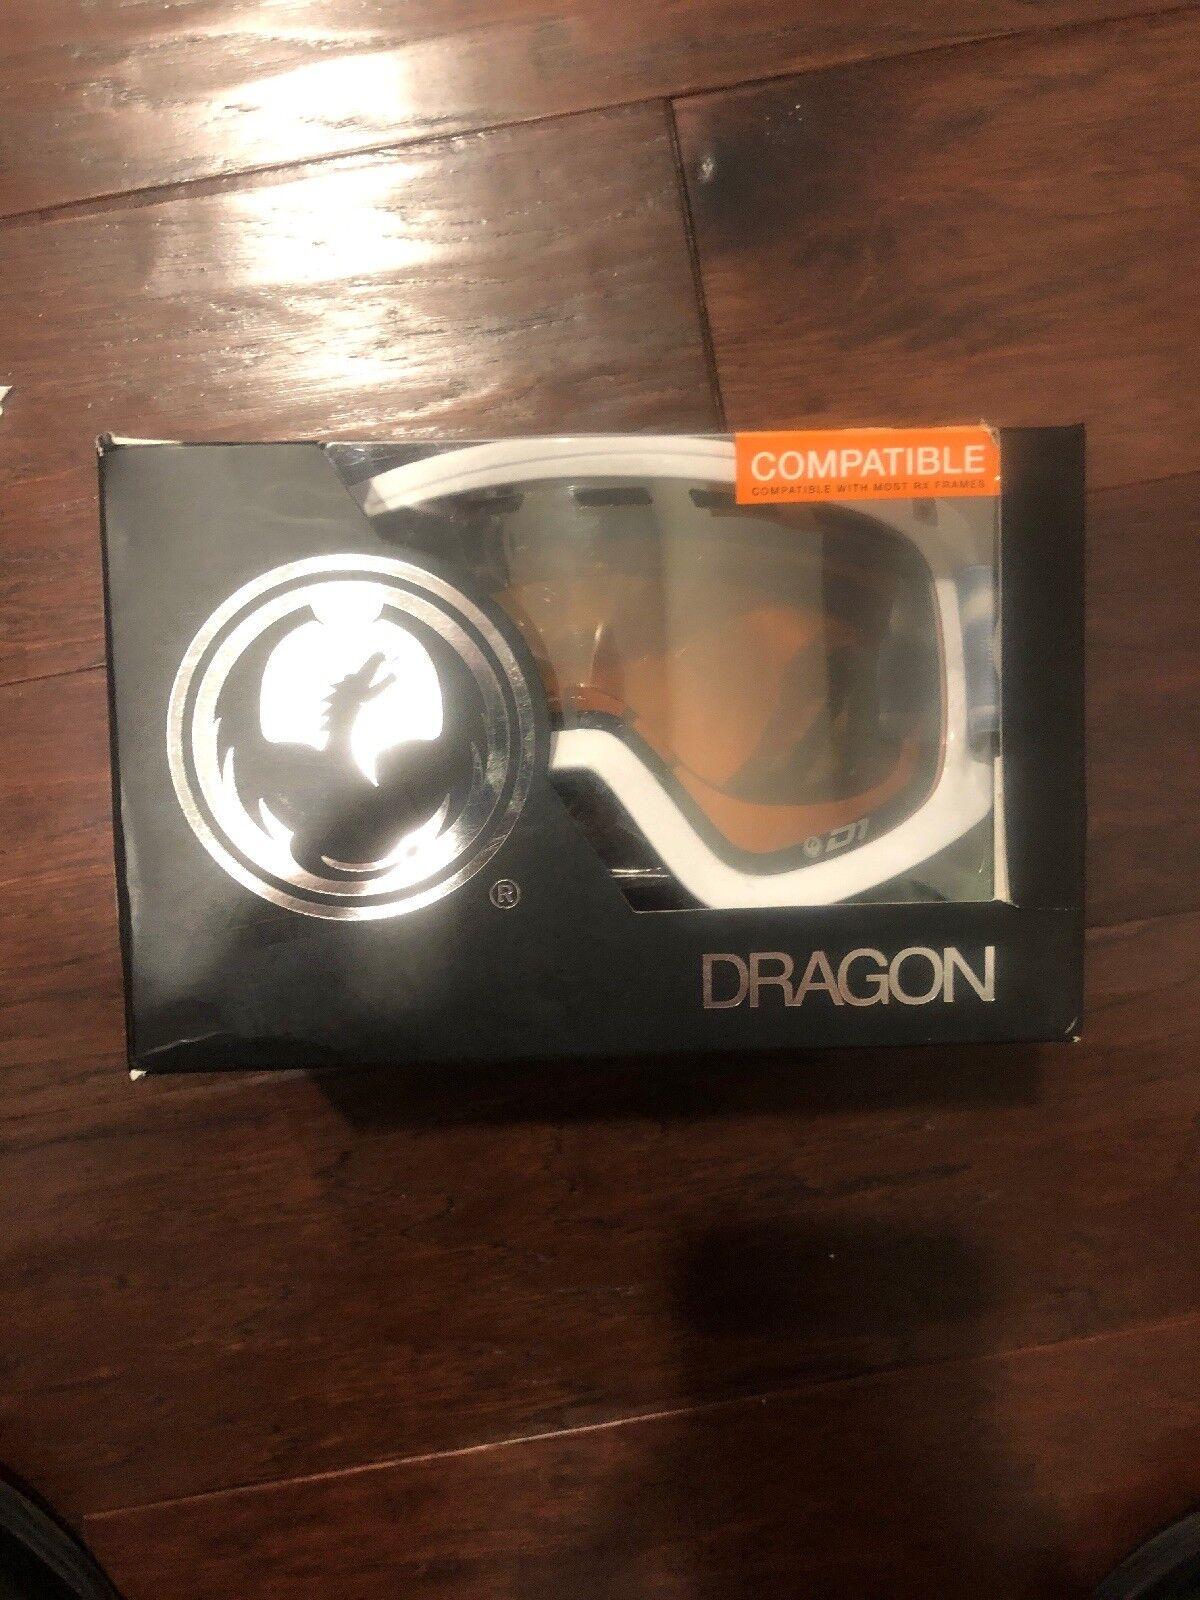 Nuovo Dragon D1 Ski Snowboard Occhiali Onus blu - Ionized Plus Lens Plus Ionized Bonus Lens b8d13c